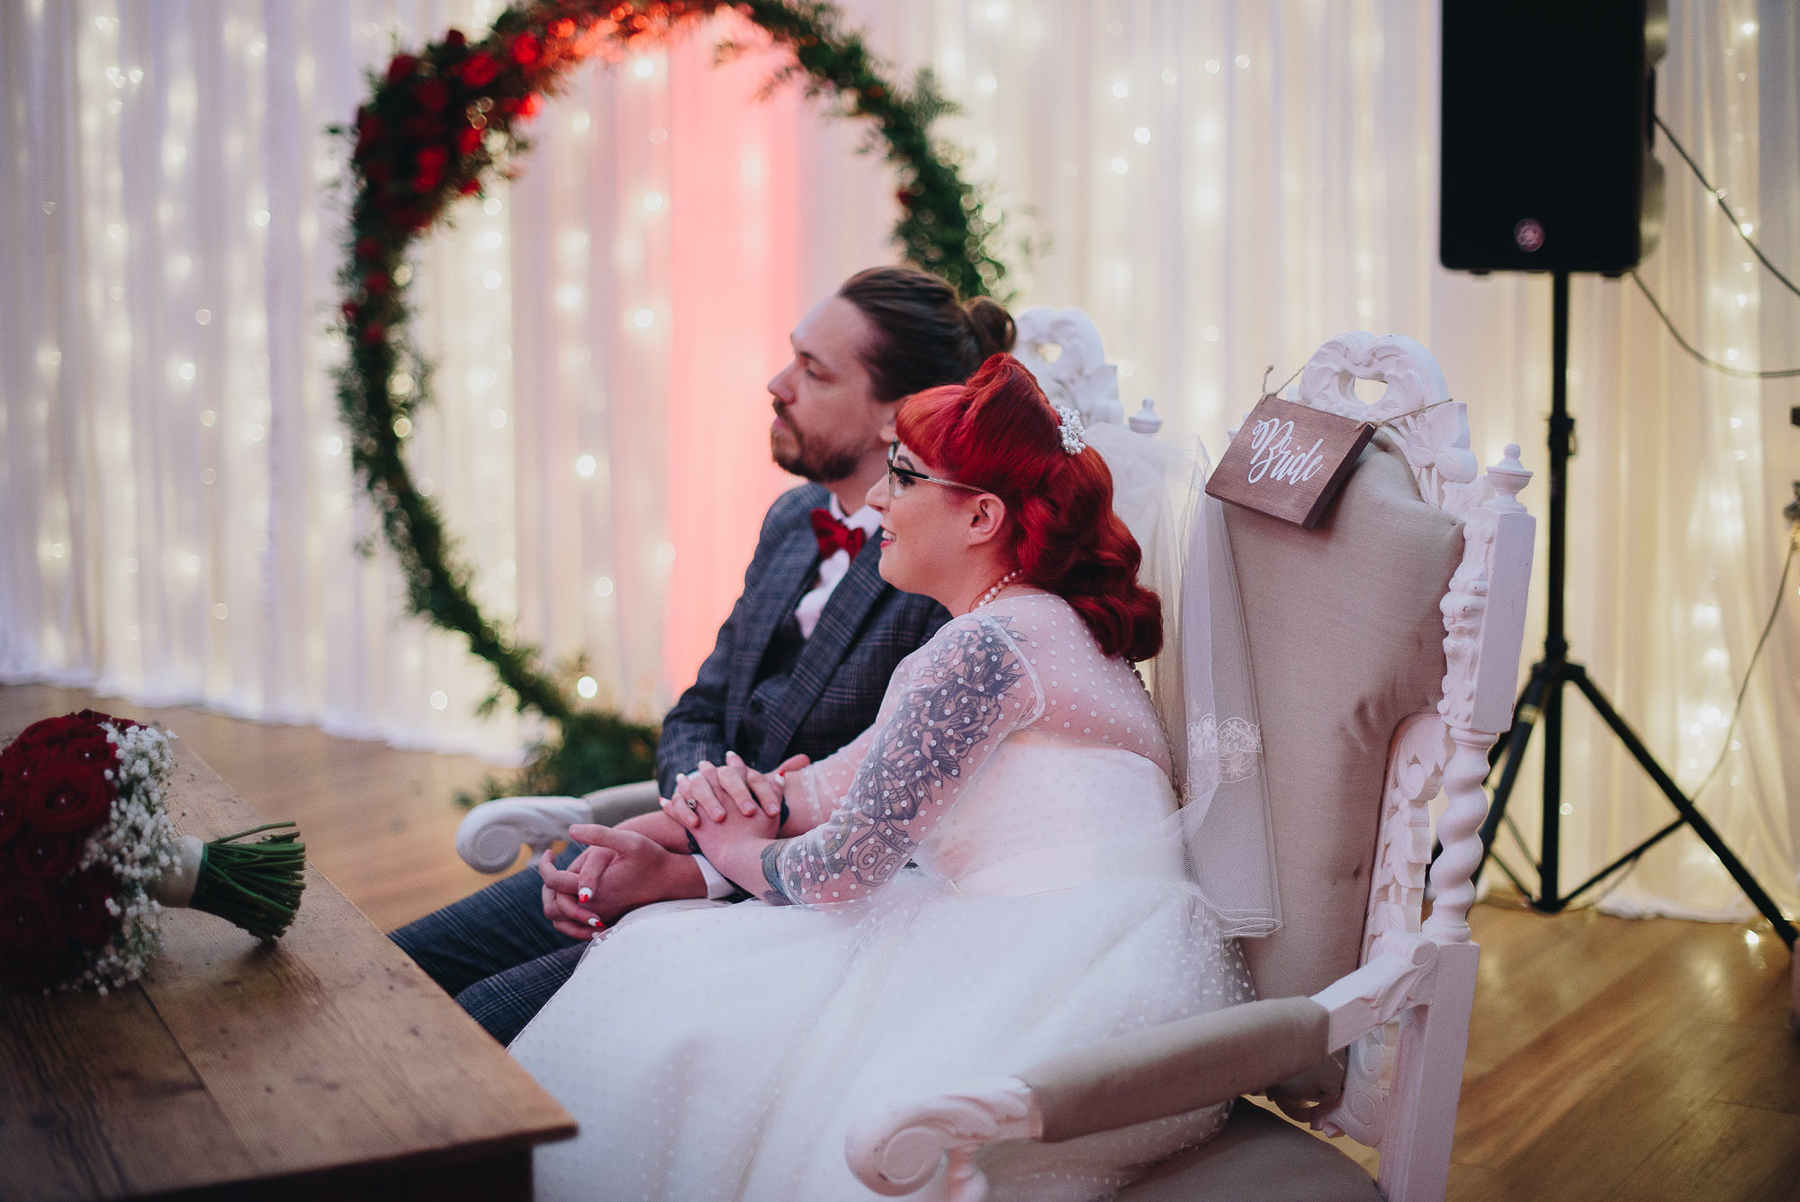 Wellbeing_Farm_Wedding_Photography_The_Pin-Up_Bride_Lara_Shaun-61.jpg